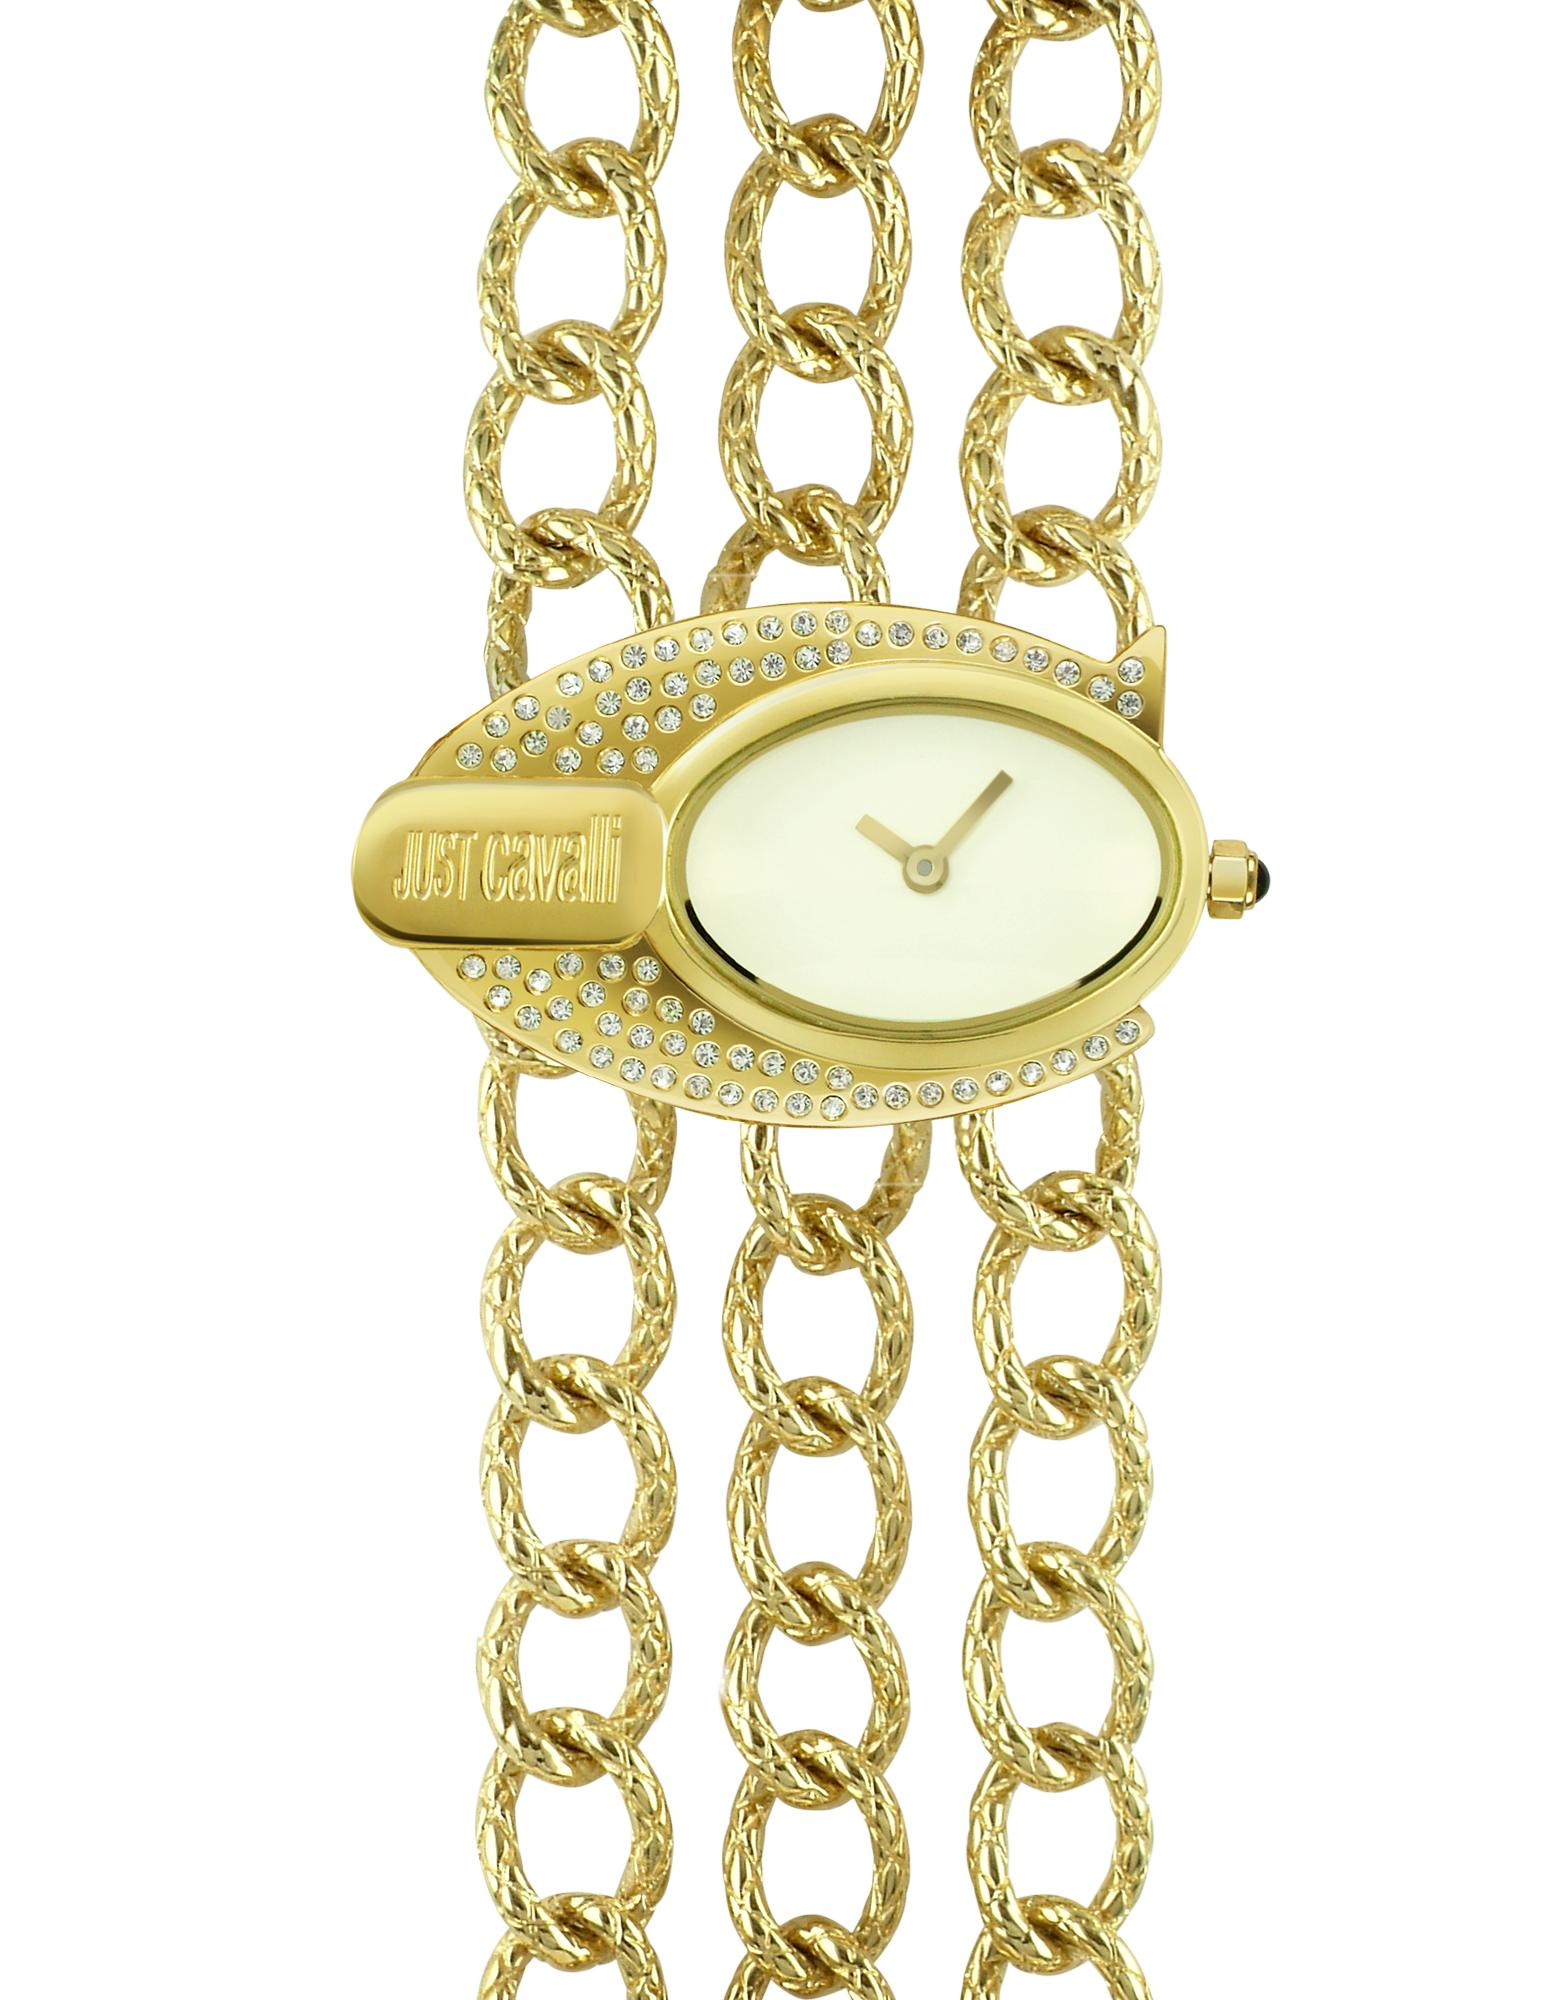 Just Cavalli Triptic - Gold Plated Chain Bracelet Dress Watch